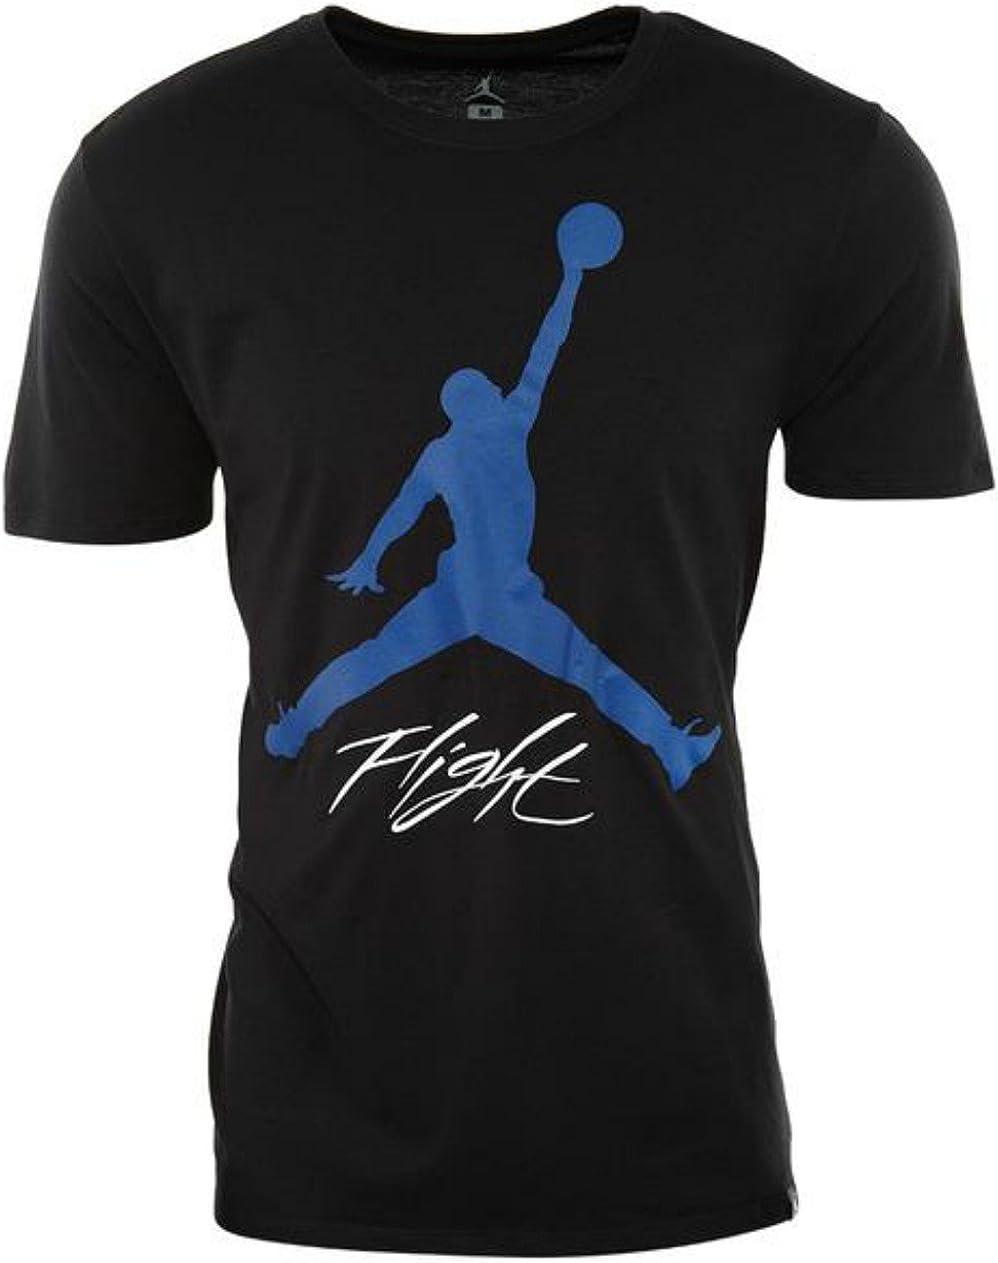 desempleo Subjetivo colisión  Nike Blue Chip II Women US 8 Black Basketball Shoe: Amazon.ca: Shoes &  Handbags